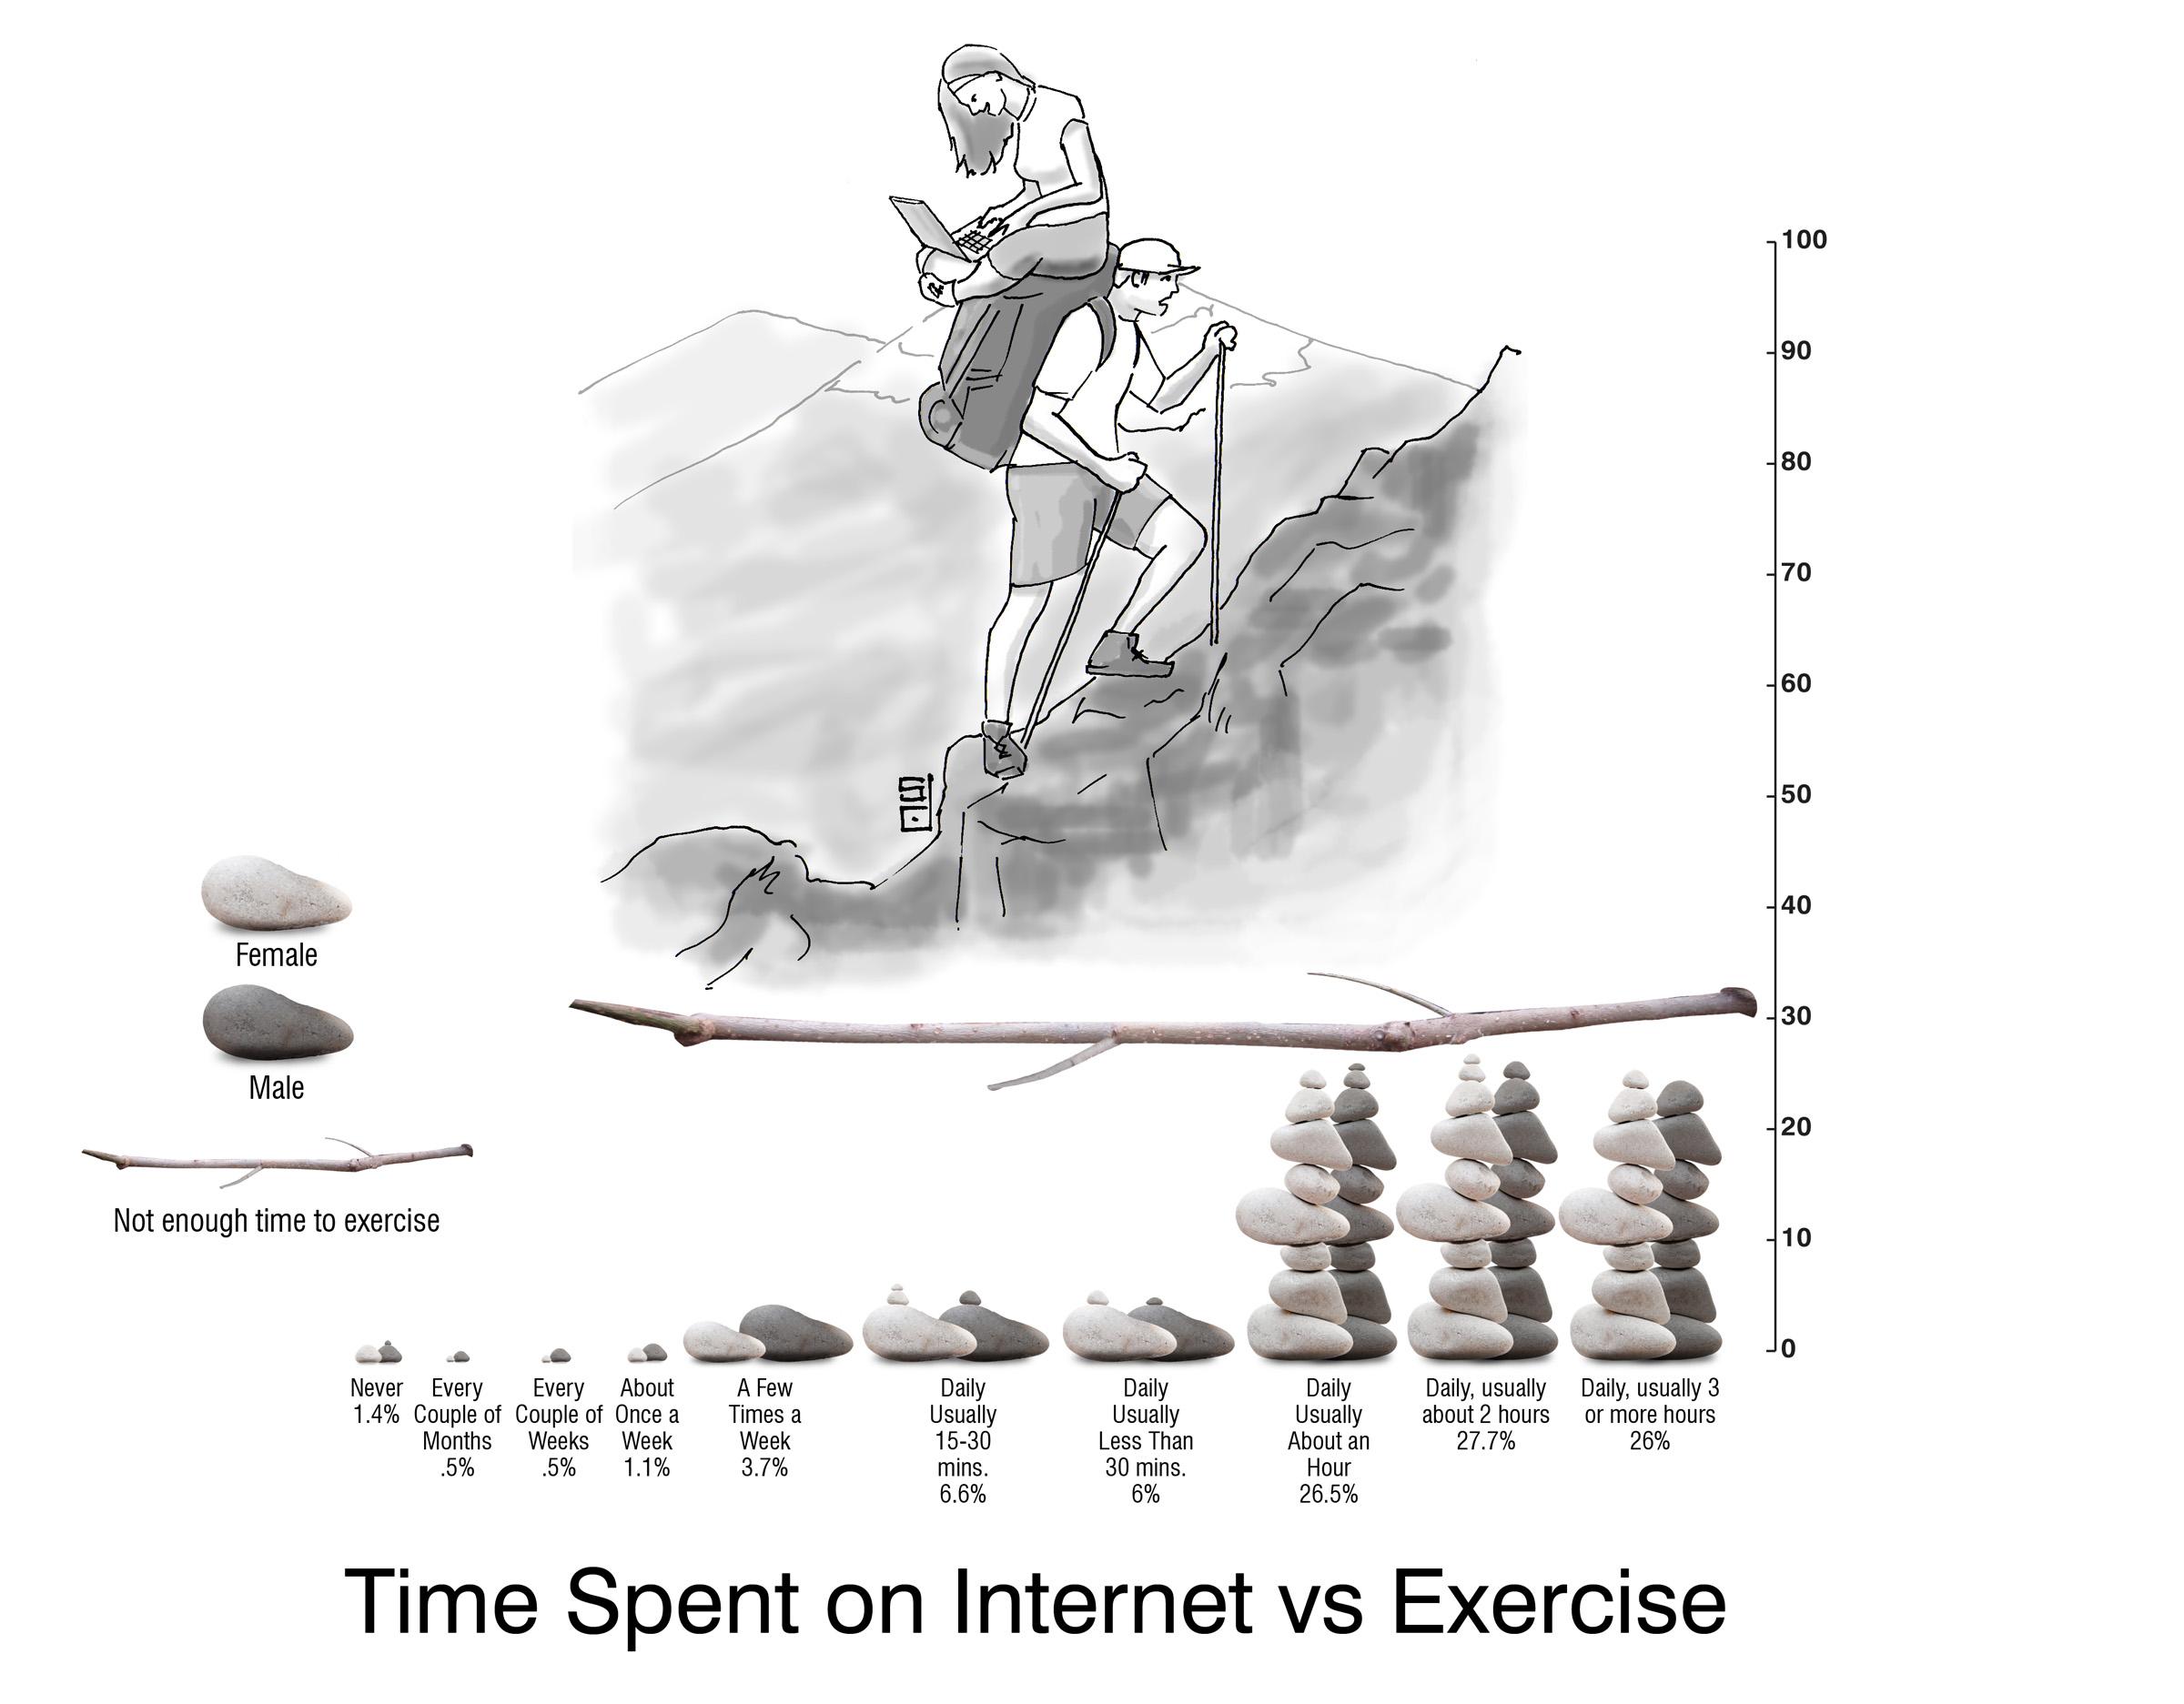 2011-08-15-internetvsexercise_graph1.jpg